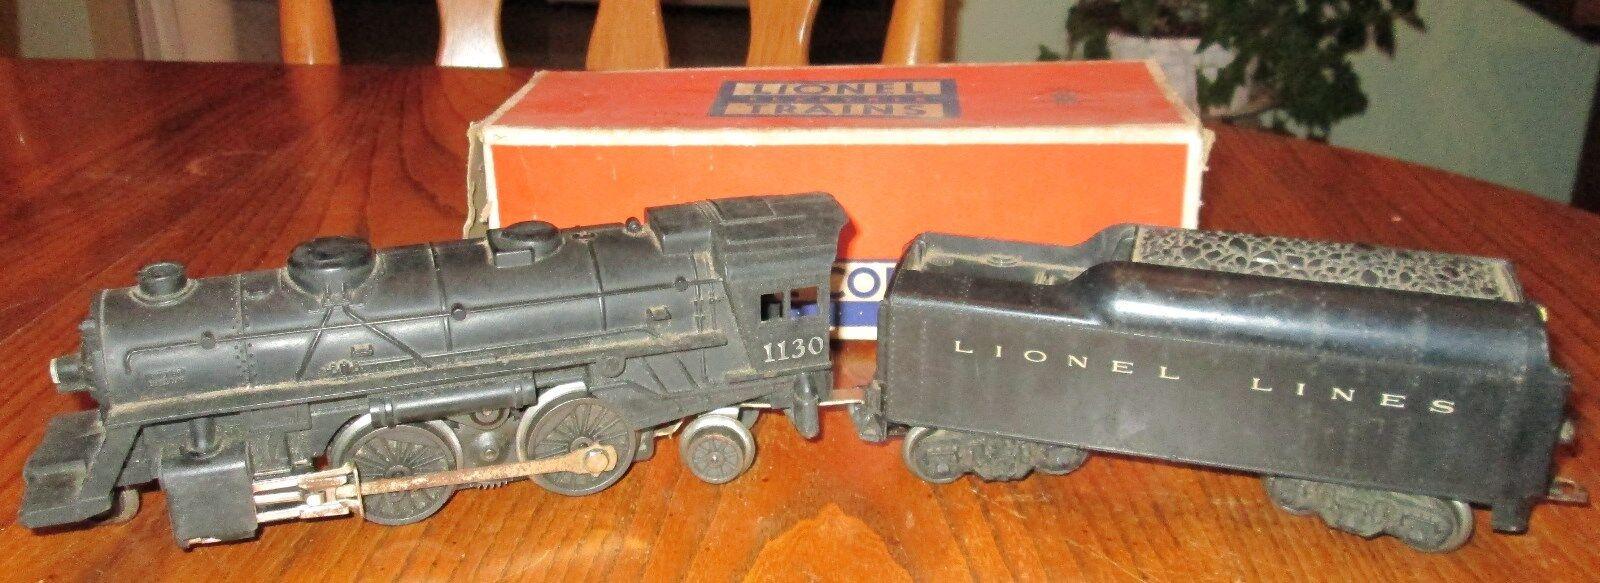 Vintage lionel lokomotive 1130 und kohle auto original box 027